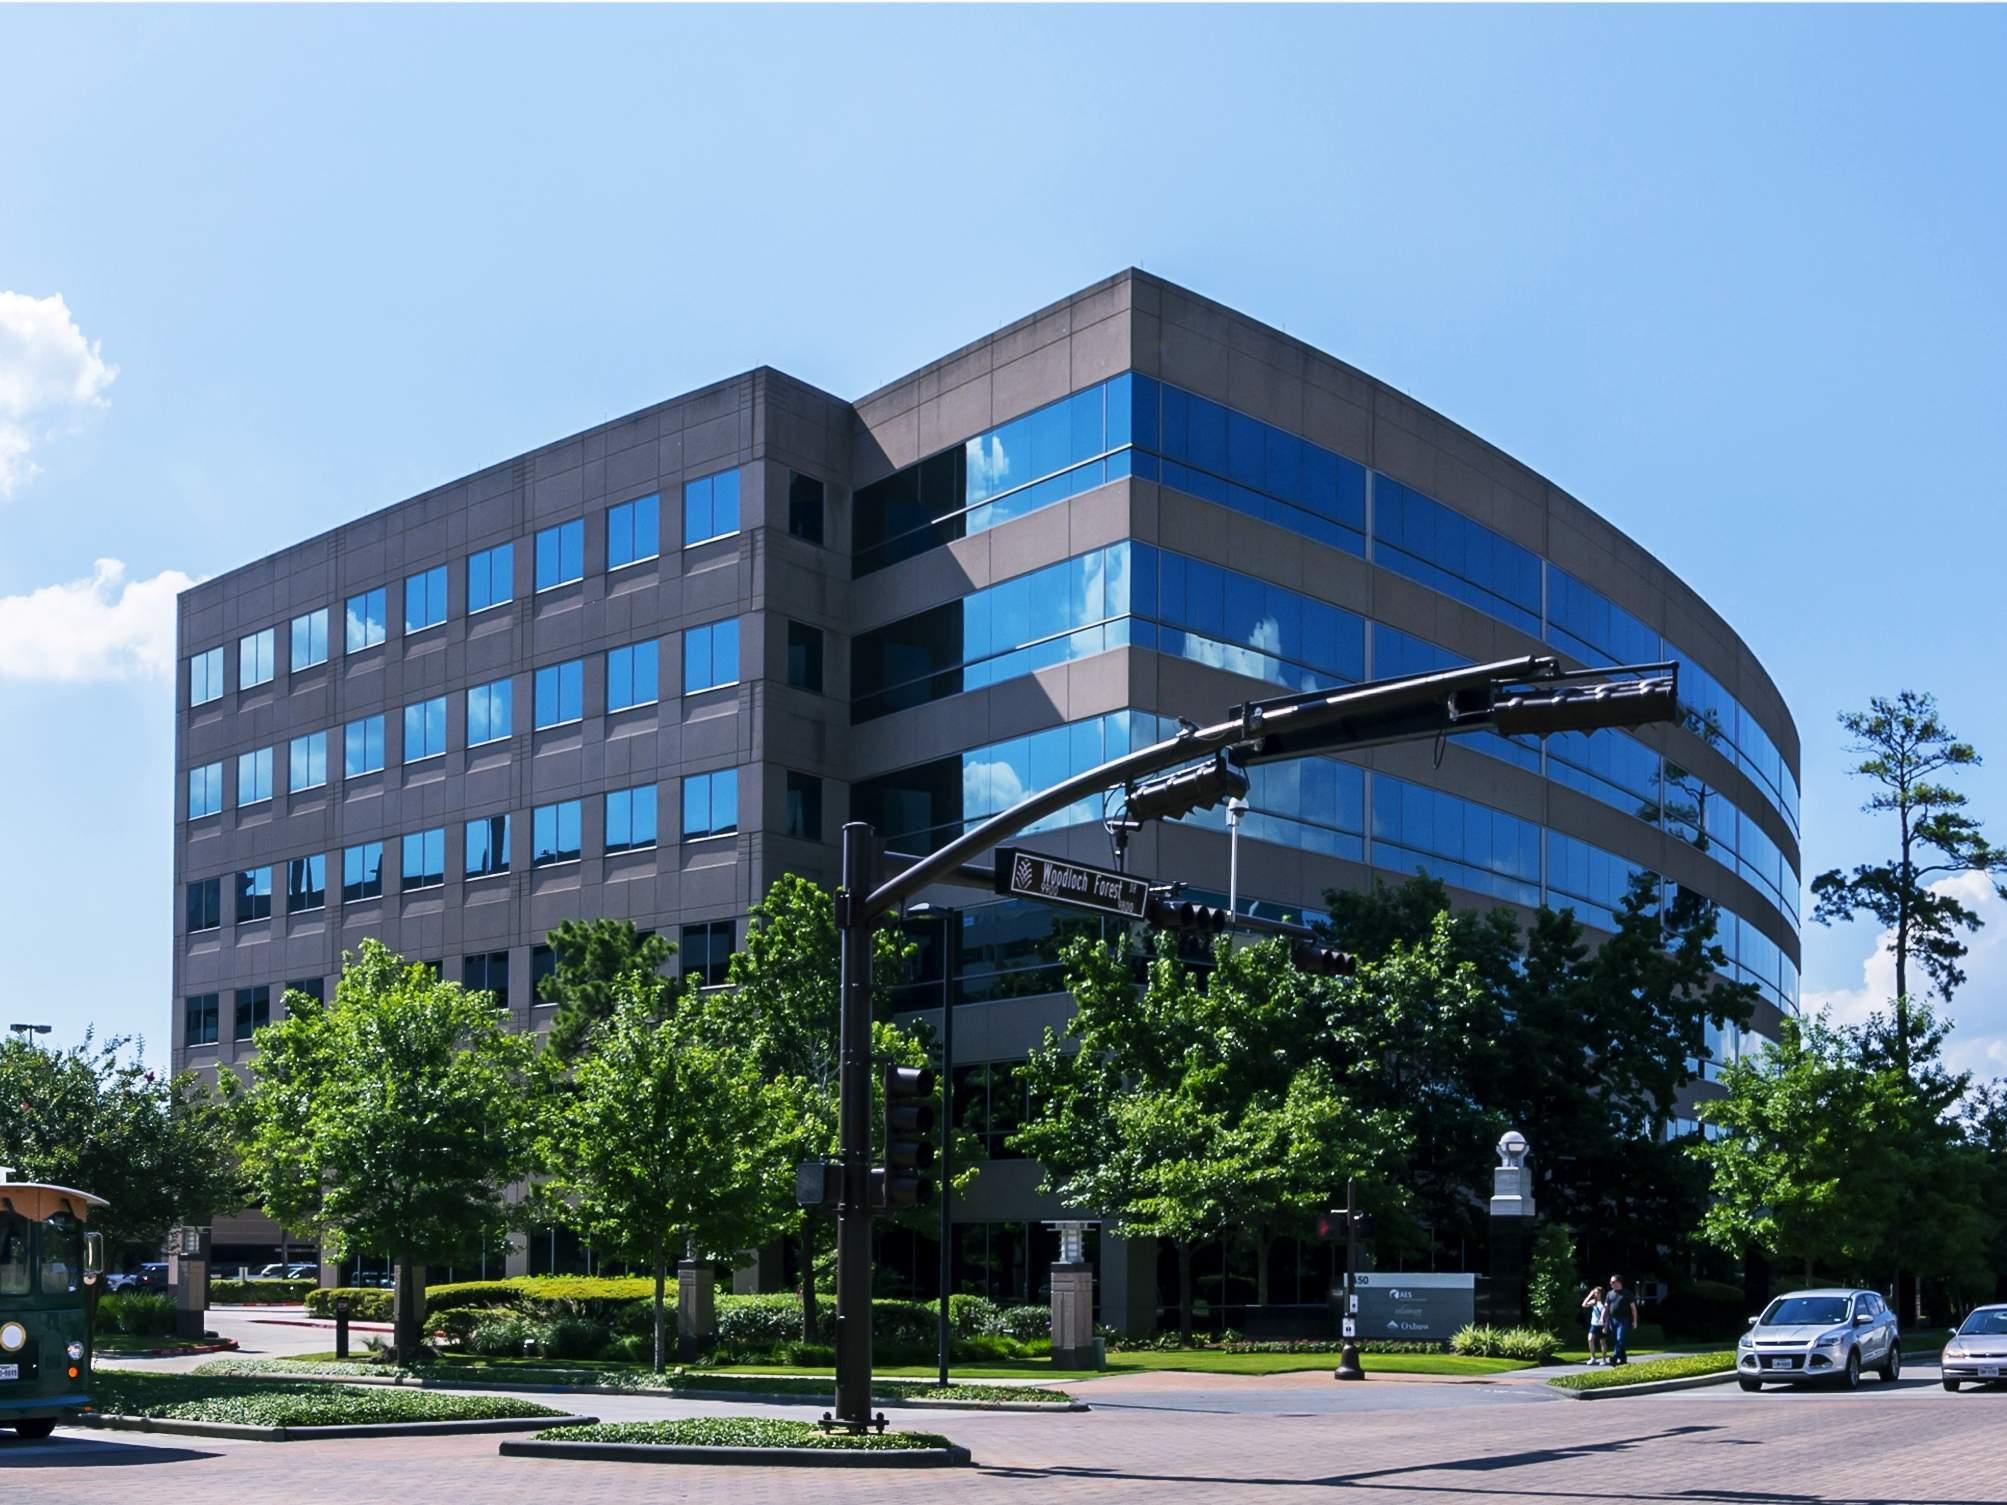 LGI Homes Corporate Office